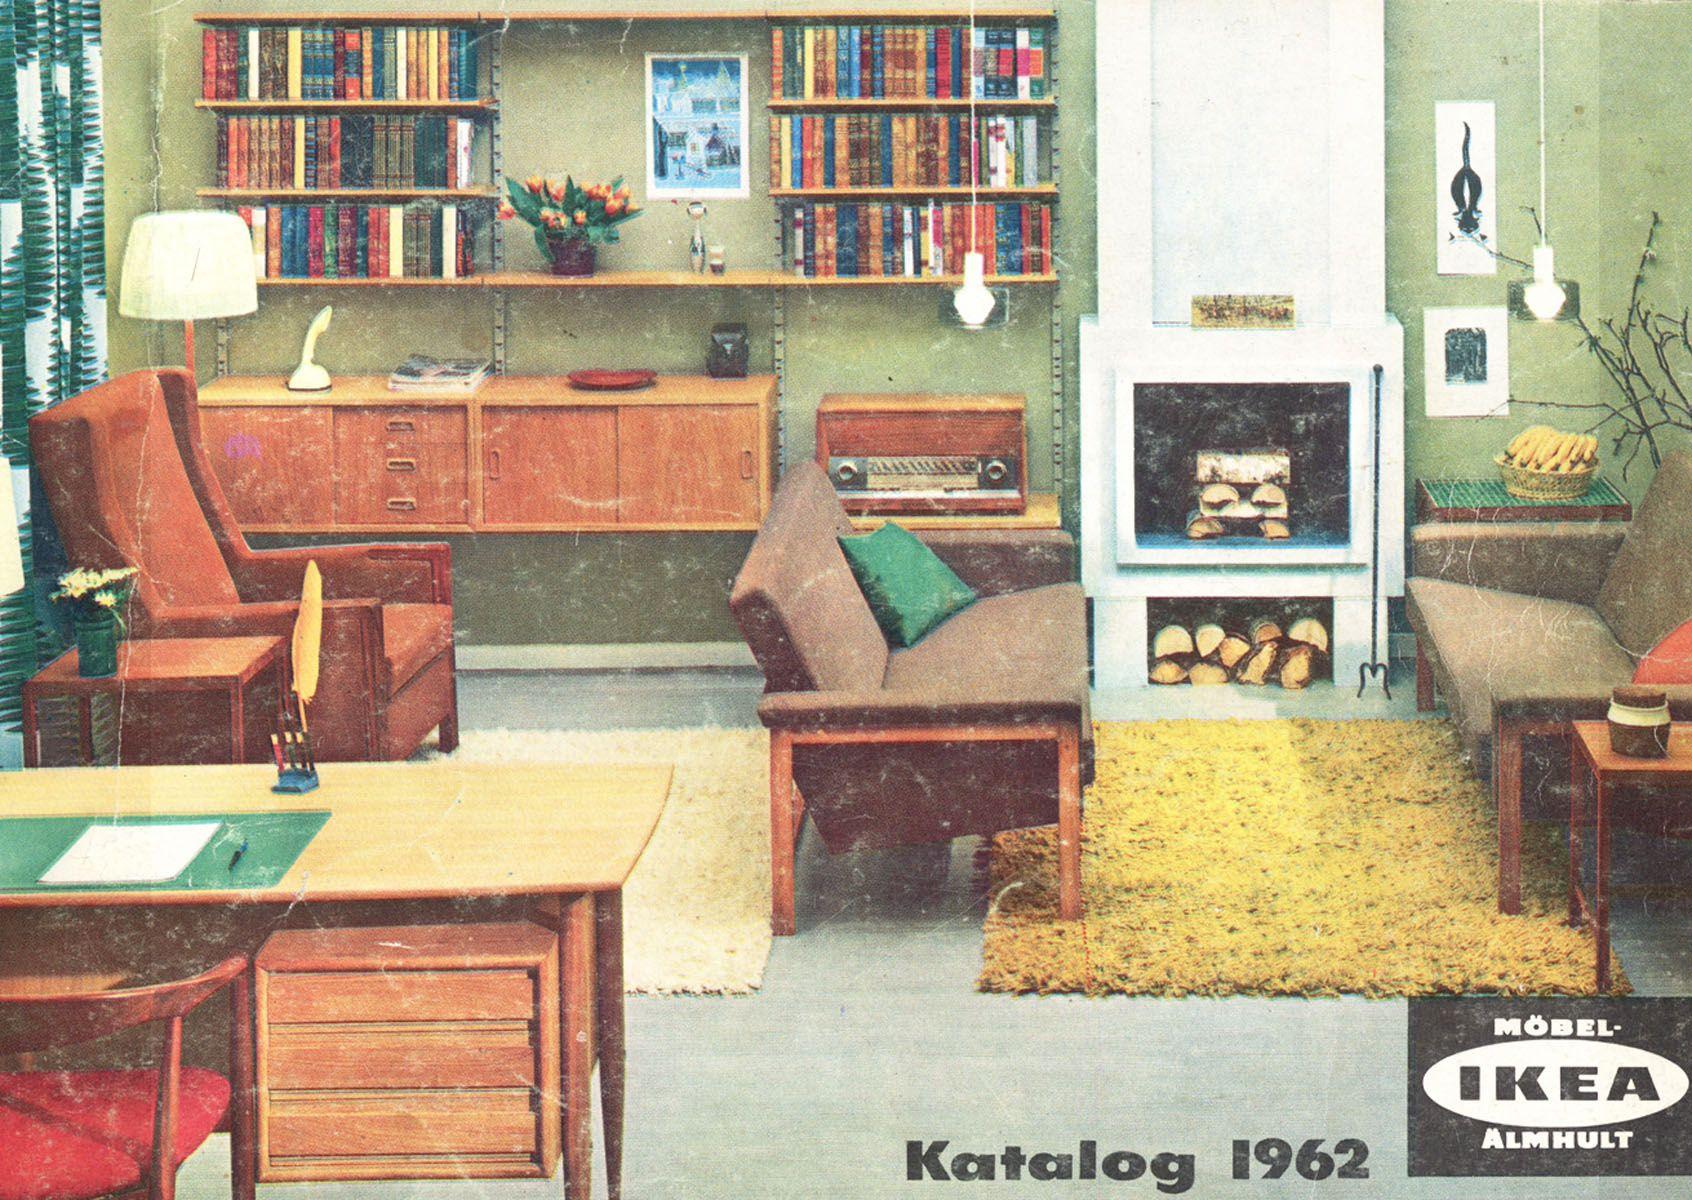 Vintage Ikea Ikea 1962  Ikea Catalogue Covers  Pinterest  Catalog Cover